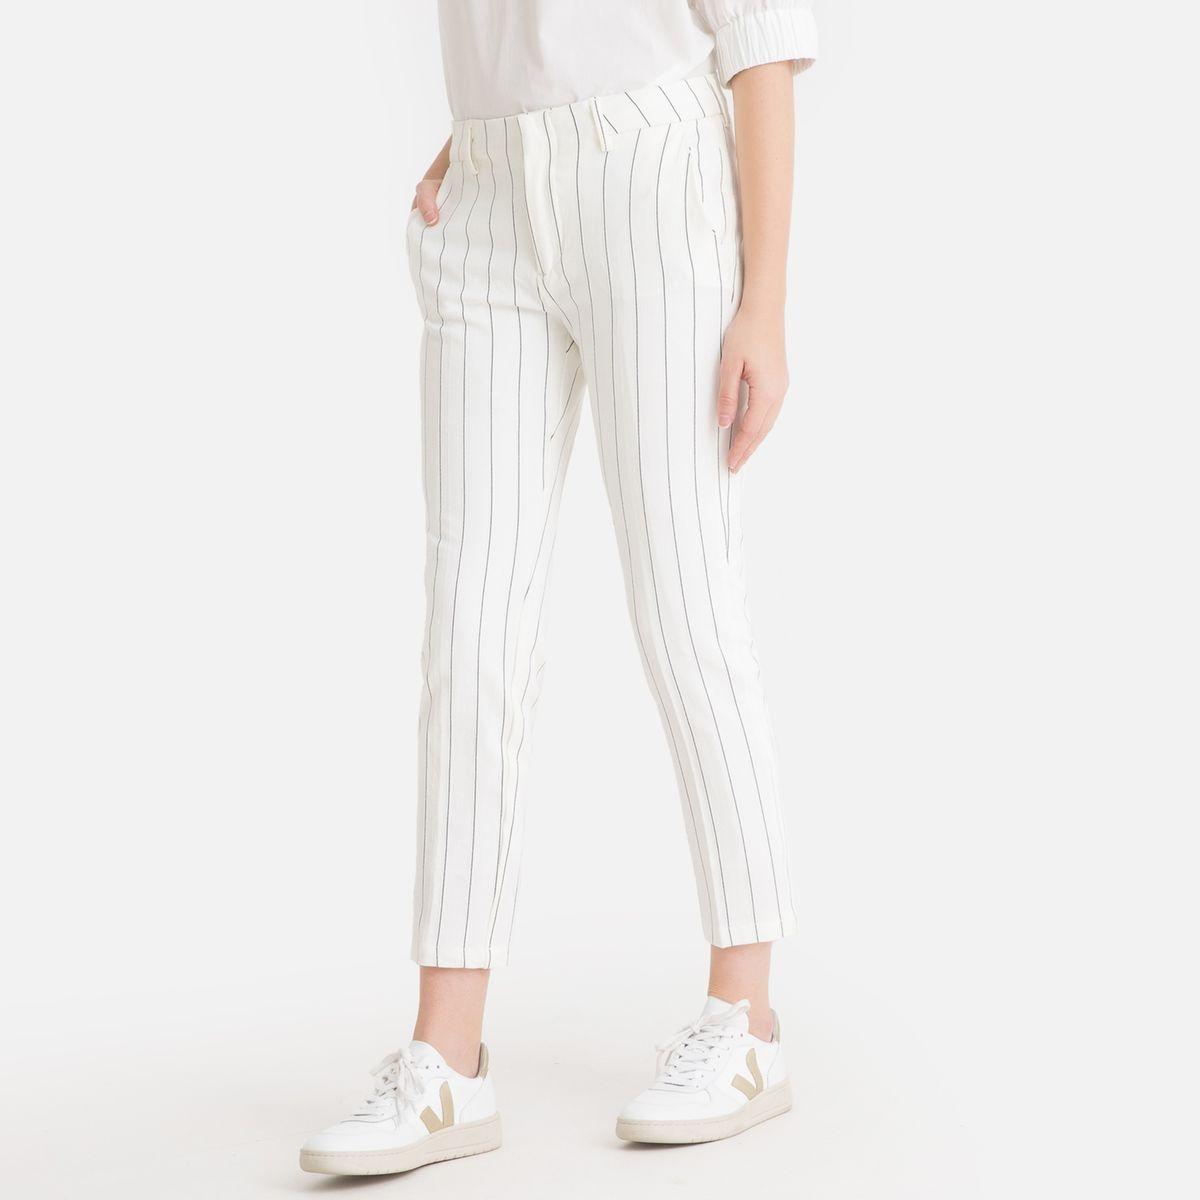 Pantalon rayé LIZZY FANCY